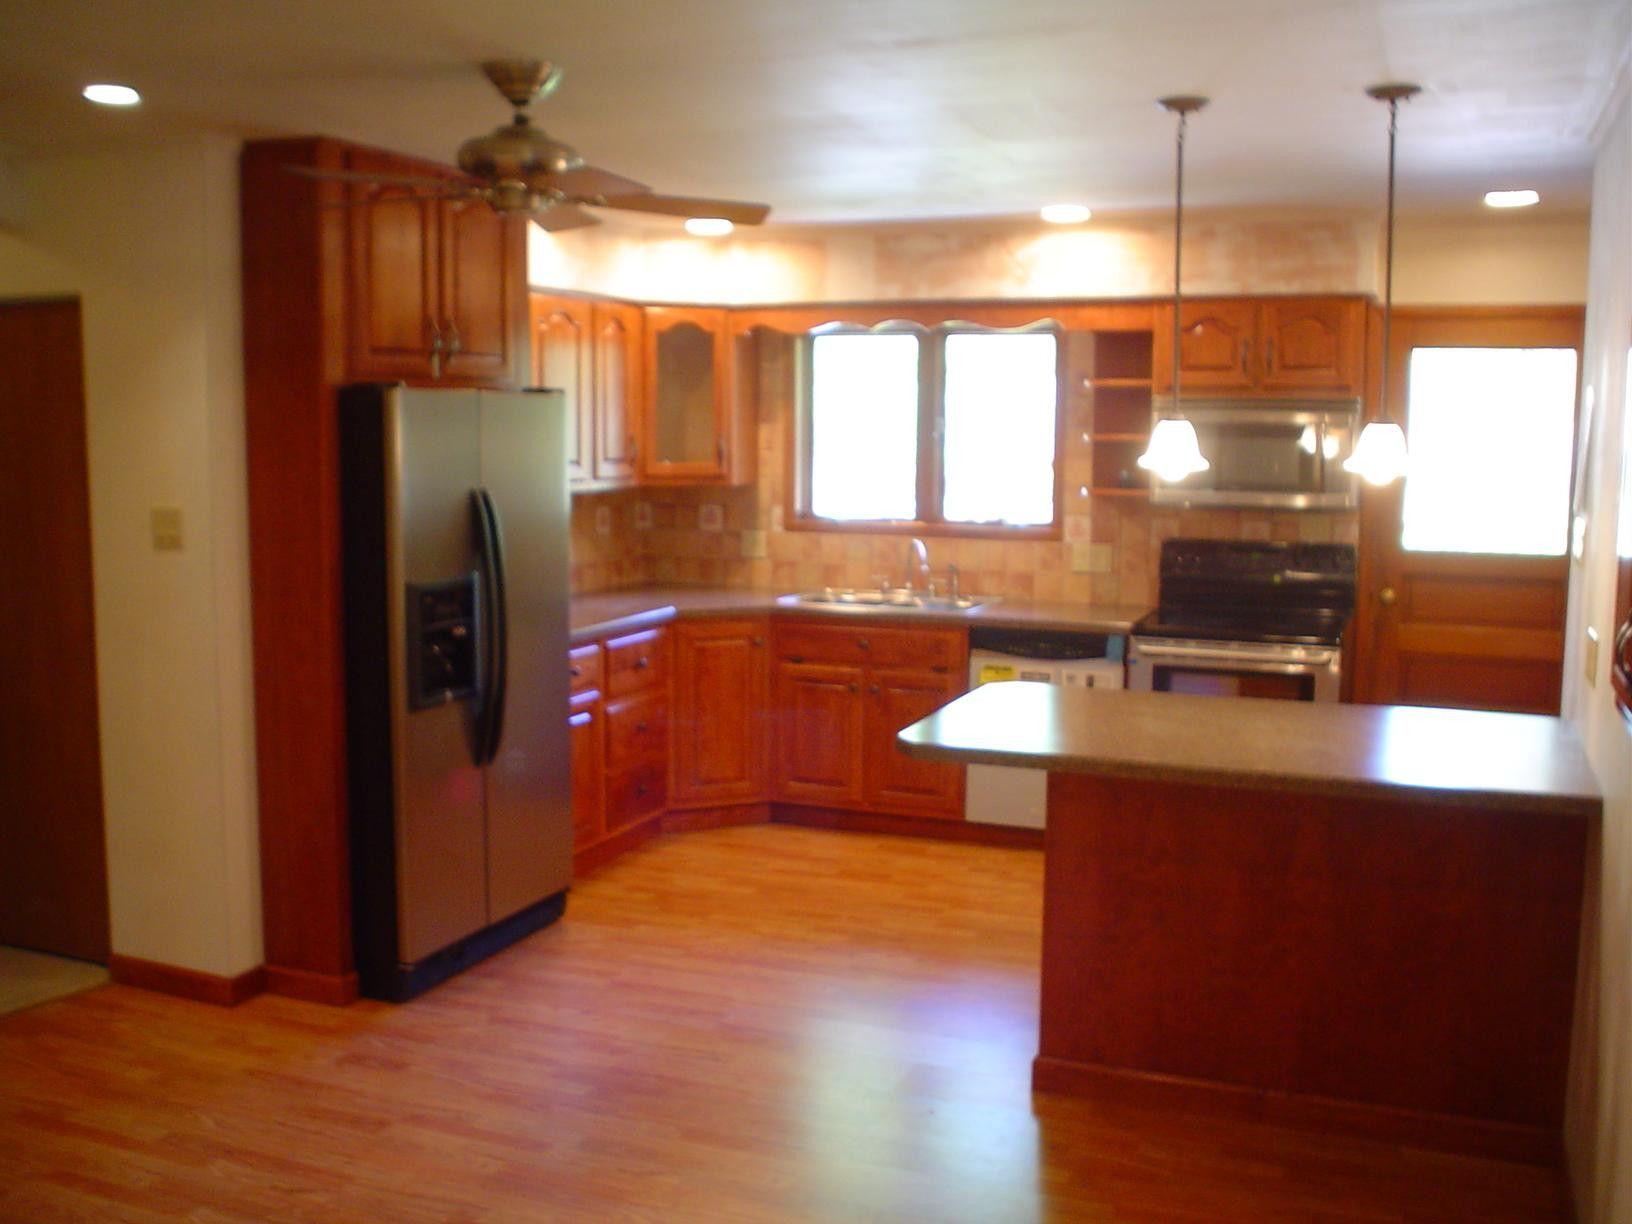 2019 Kitchen Cabinet Layout tool Online - Kitchen island Countertop ...